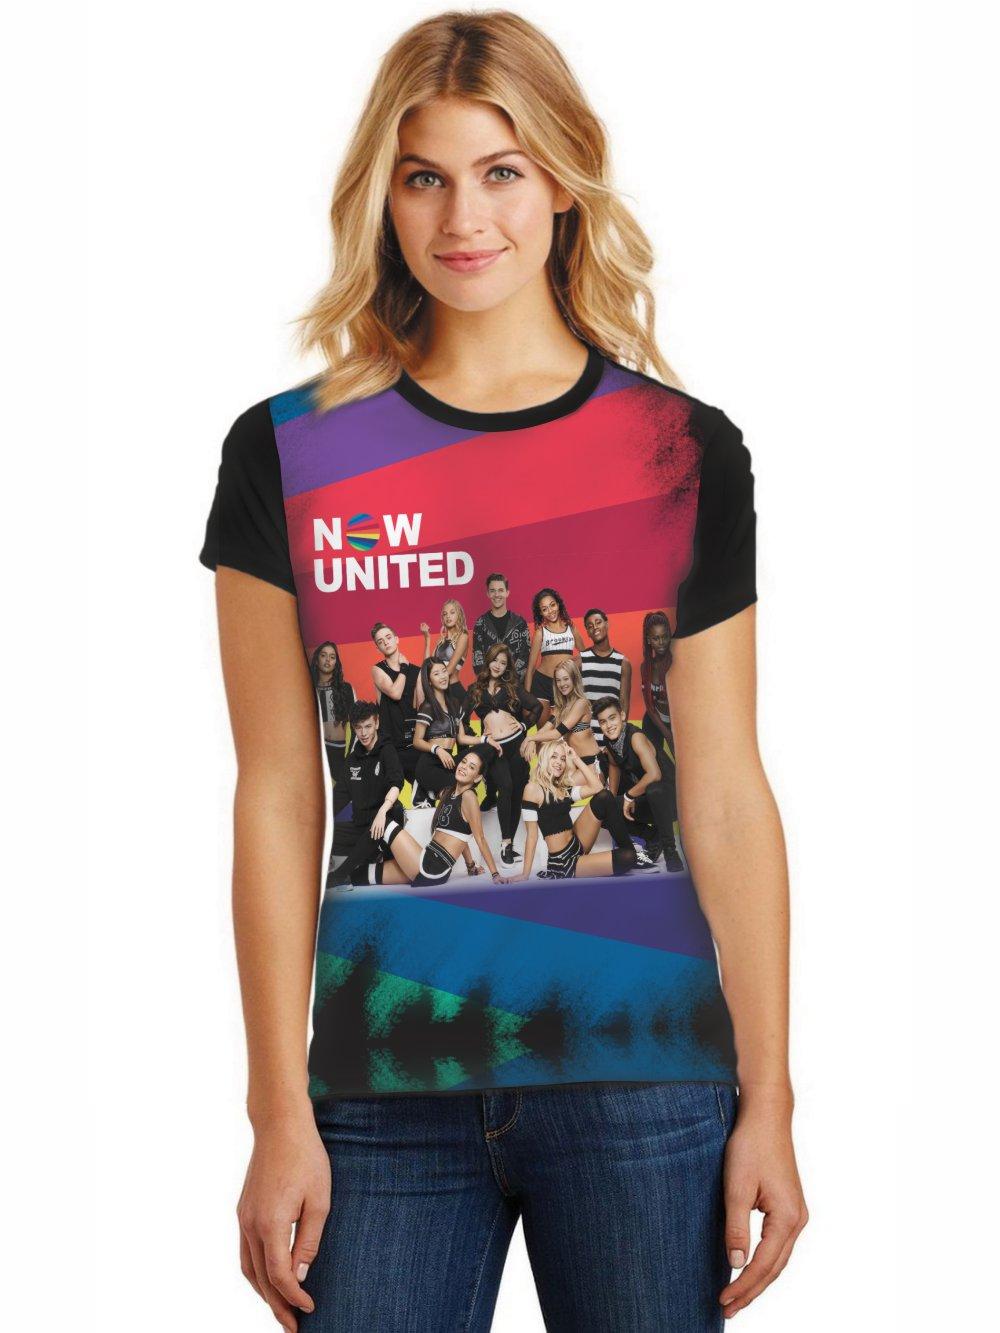 Camiseta Feminina T-Shirt Full Printed Banda Now United Integrantes Baby Look FP_034